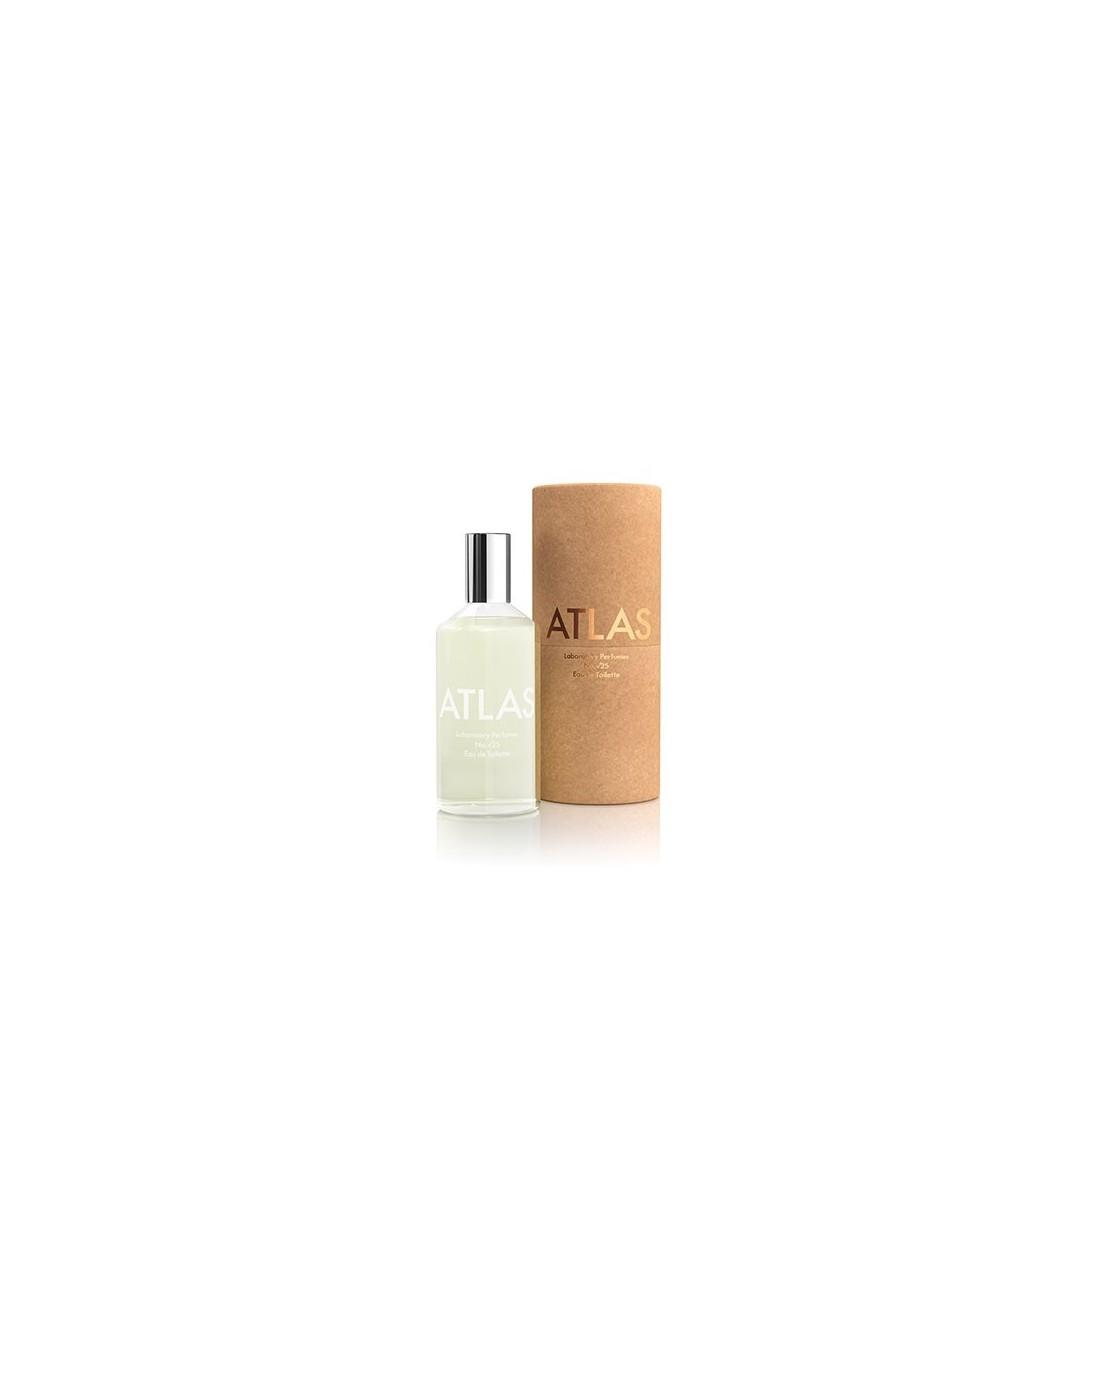 LaboratoryÊ Perfumes Atlas Eau de Toilette 100ml  5060385330098